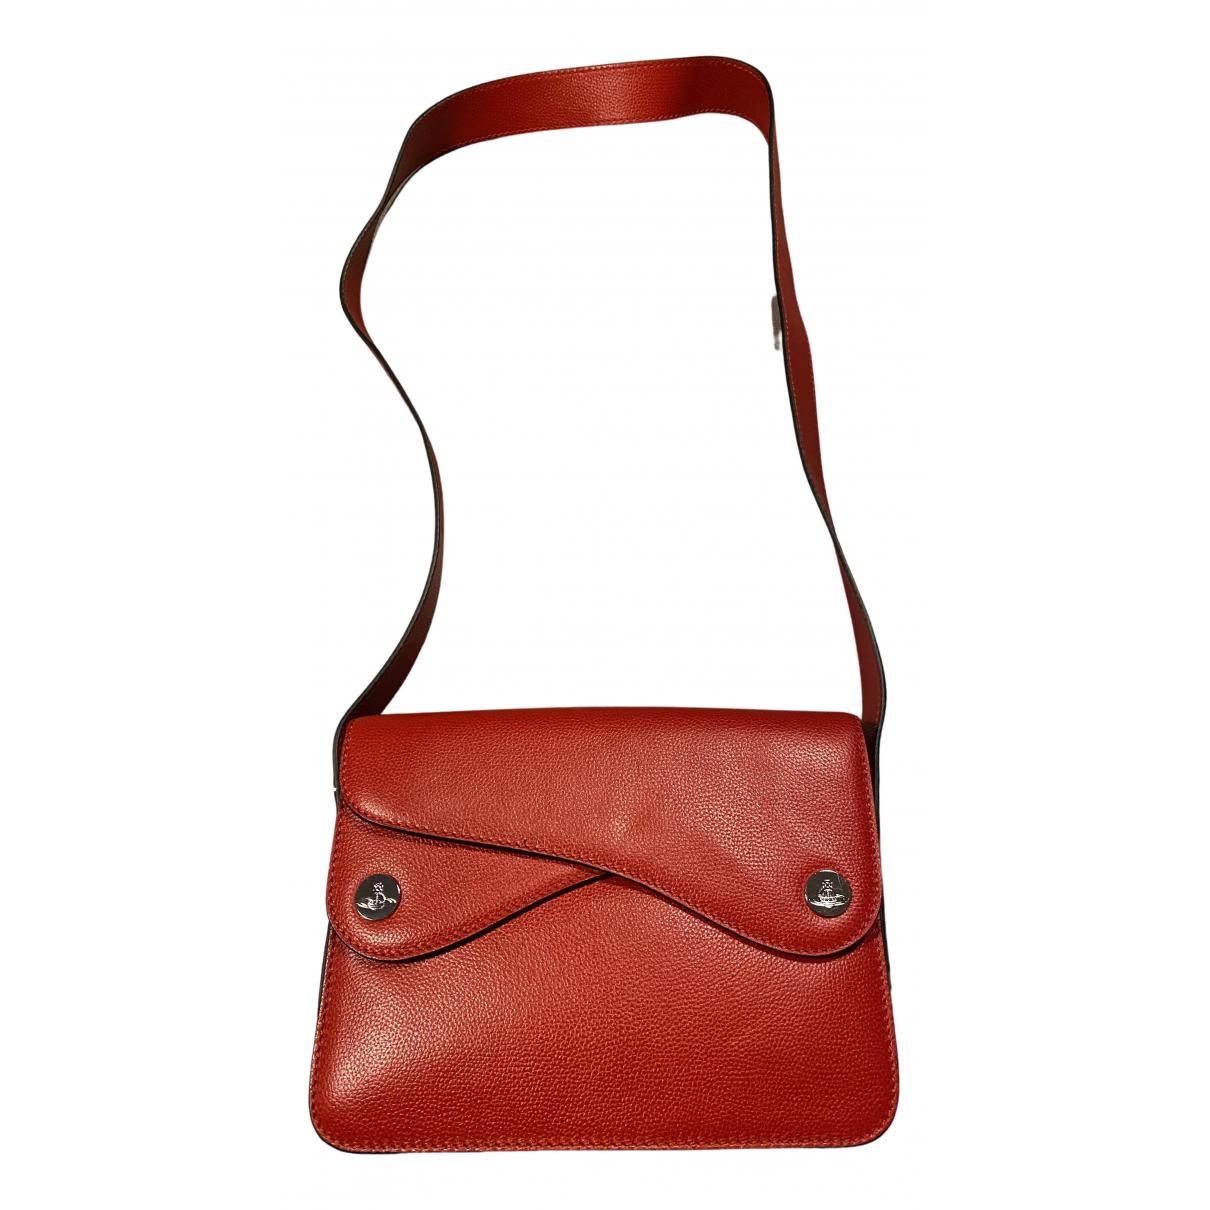 Vivienne Westwood \N Handtasche in  Rot Leder